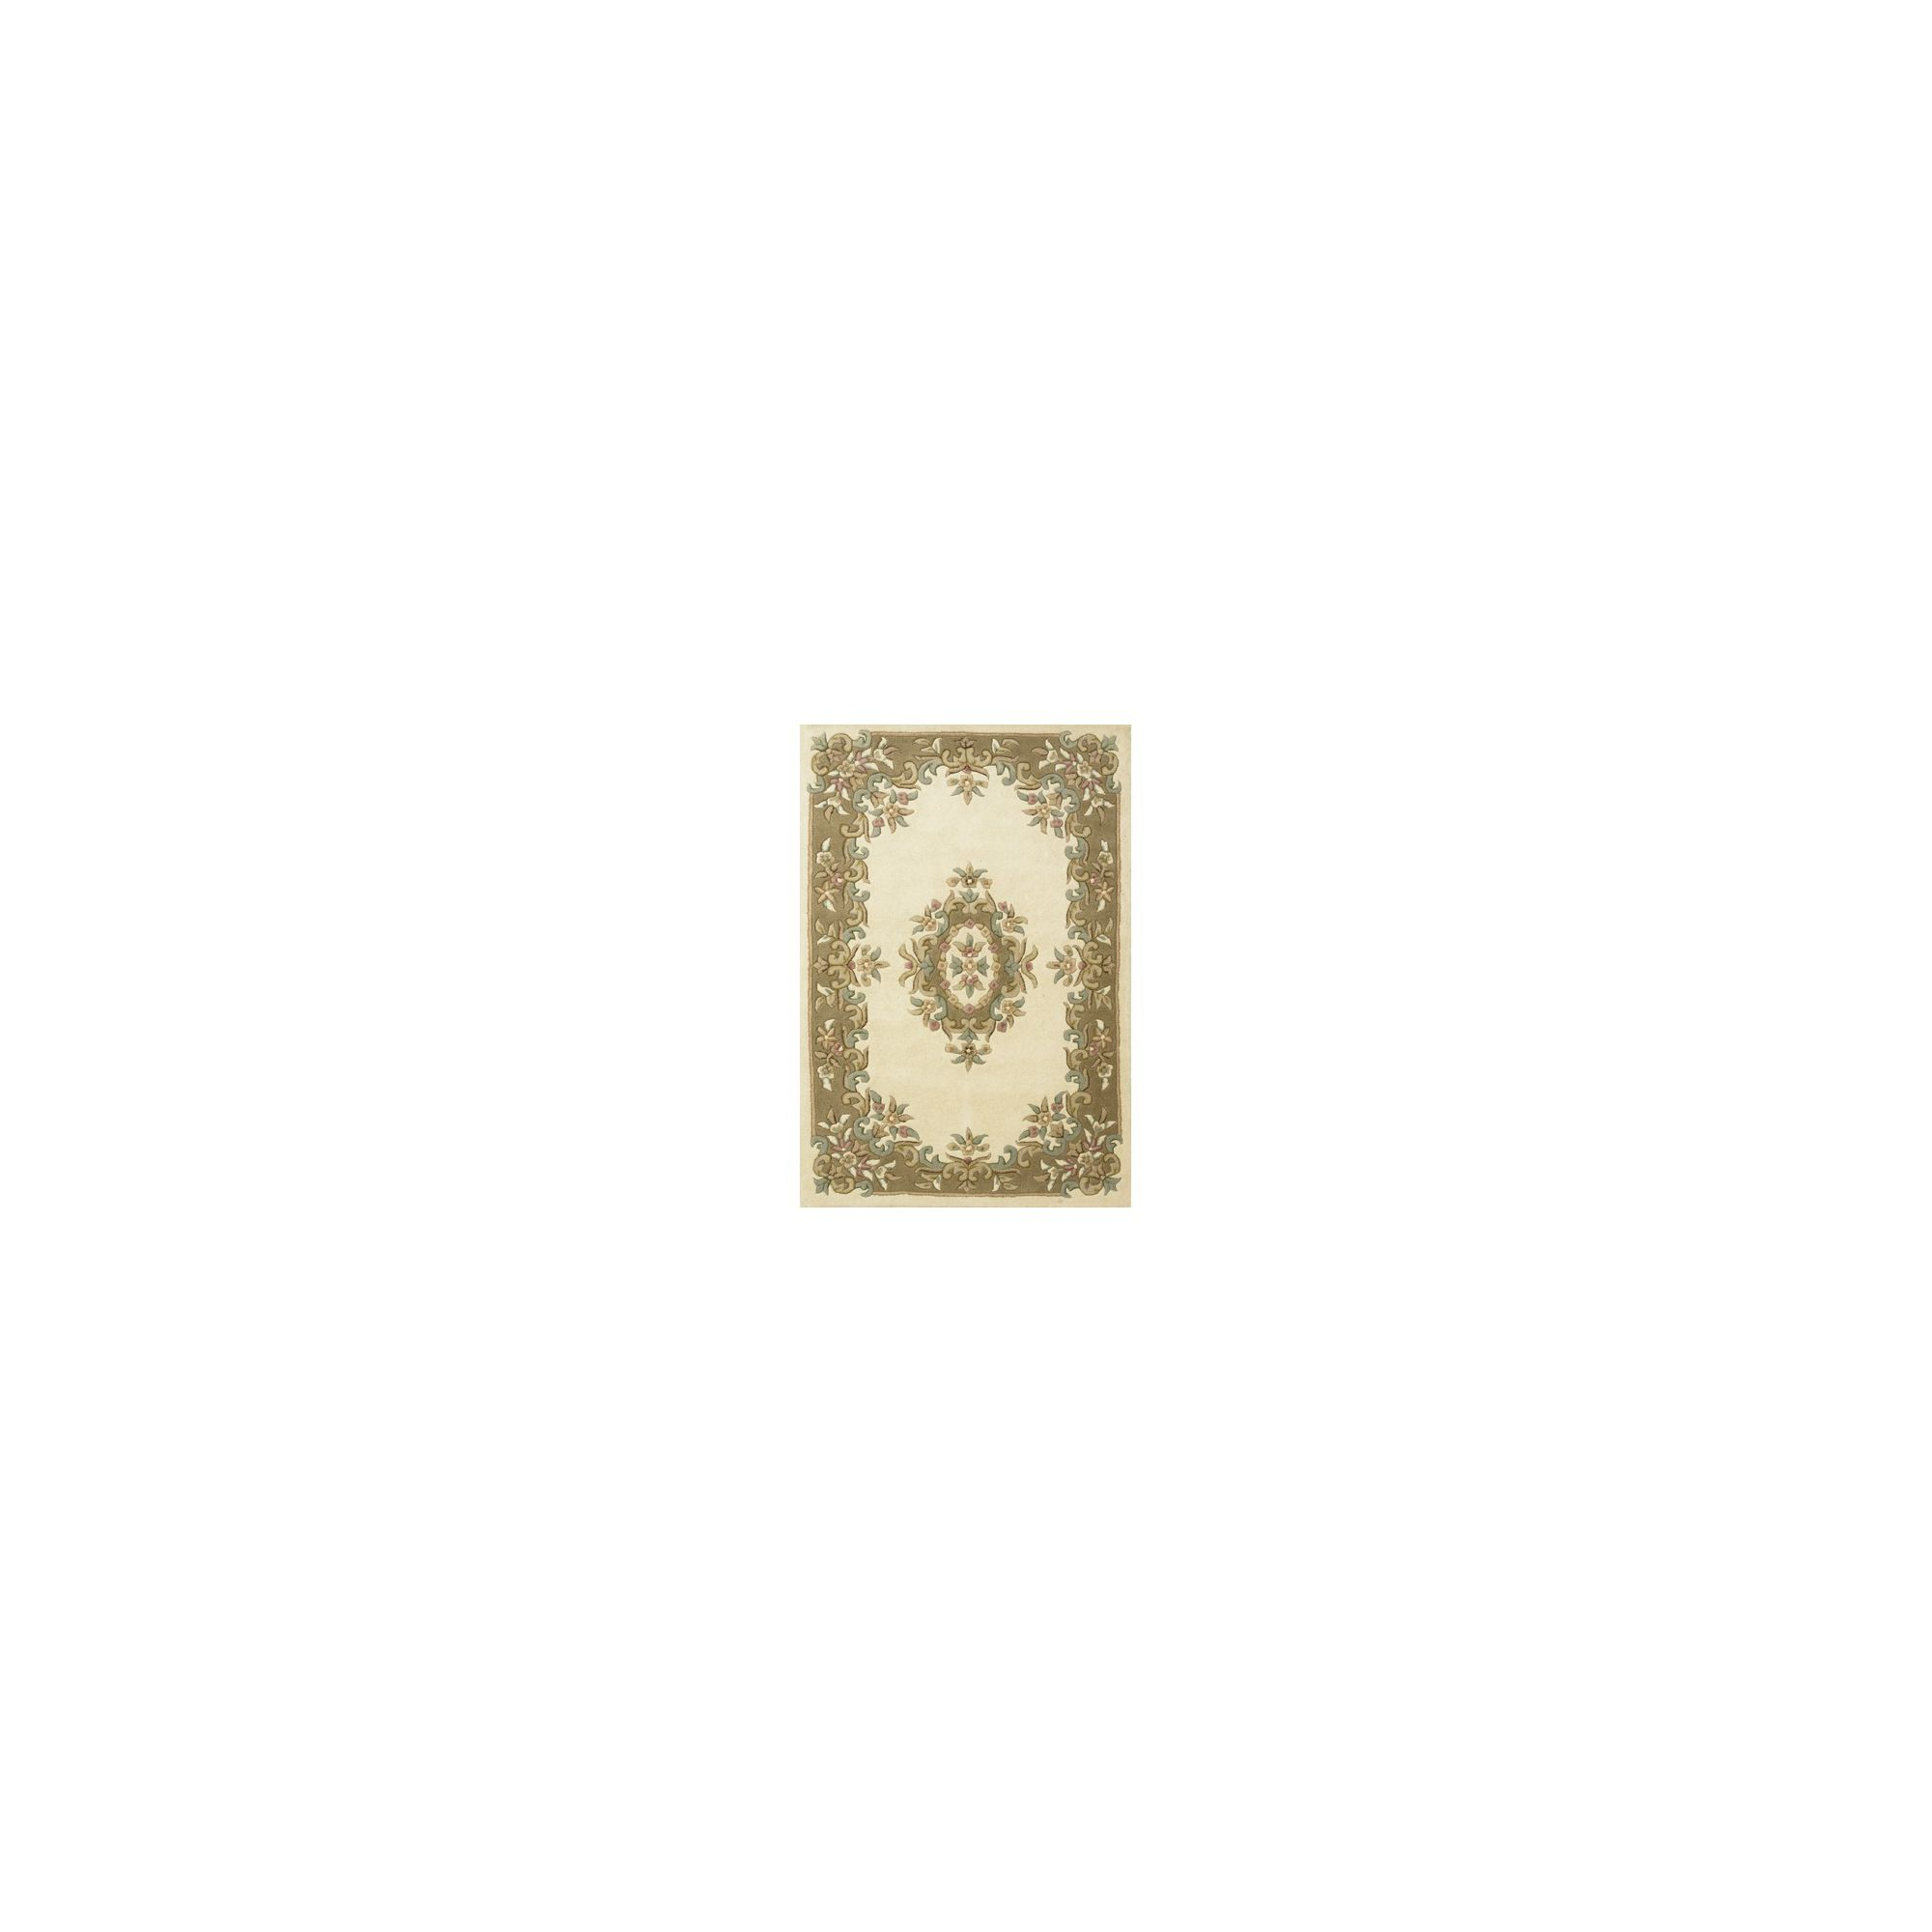 Brook Lane Rugs Royal Cream/Beige Classic Oriental Rug - 160cm x 235cm at Tesco Direct